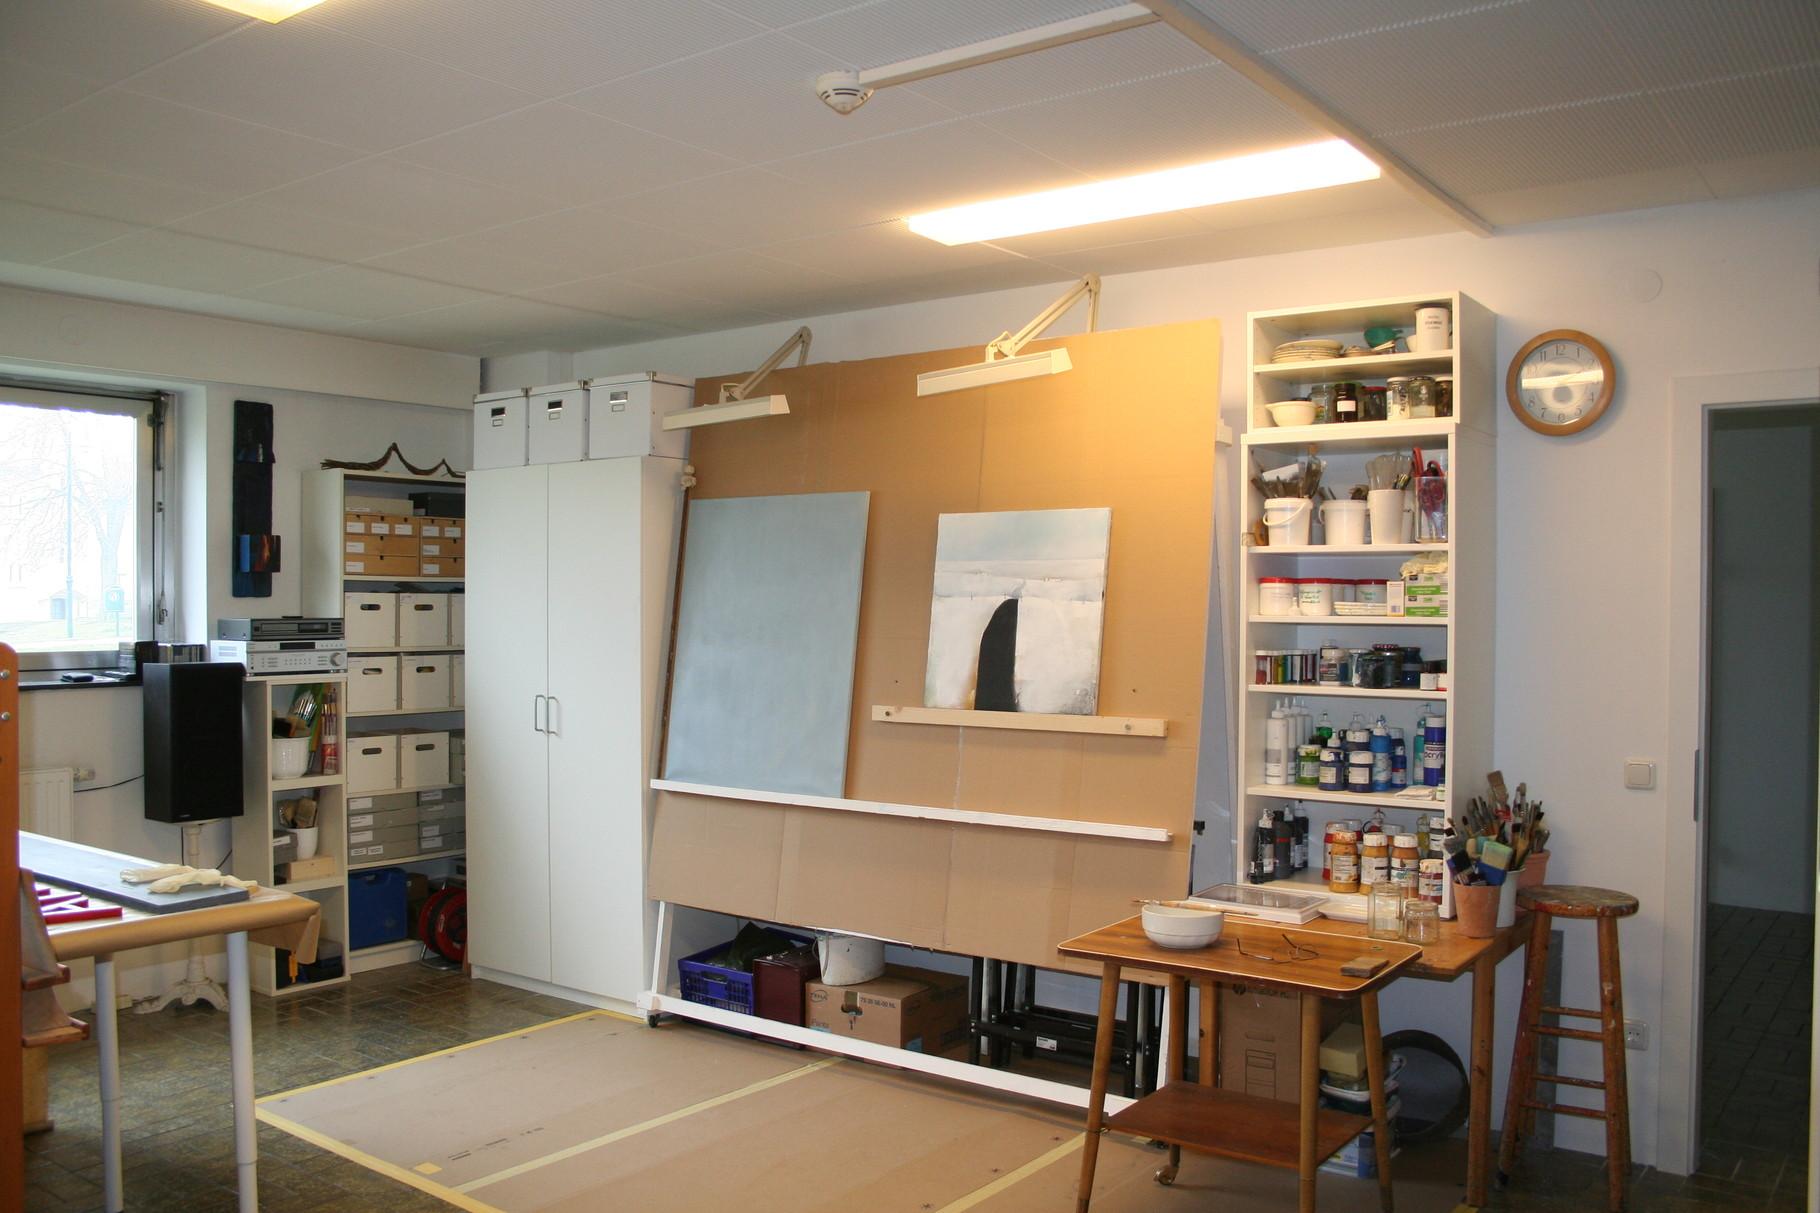 Atelier Malerei Und Grafik Kerstin Beyer